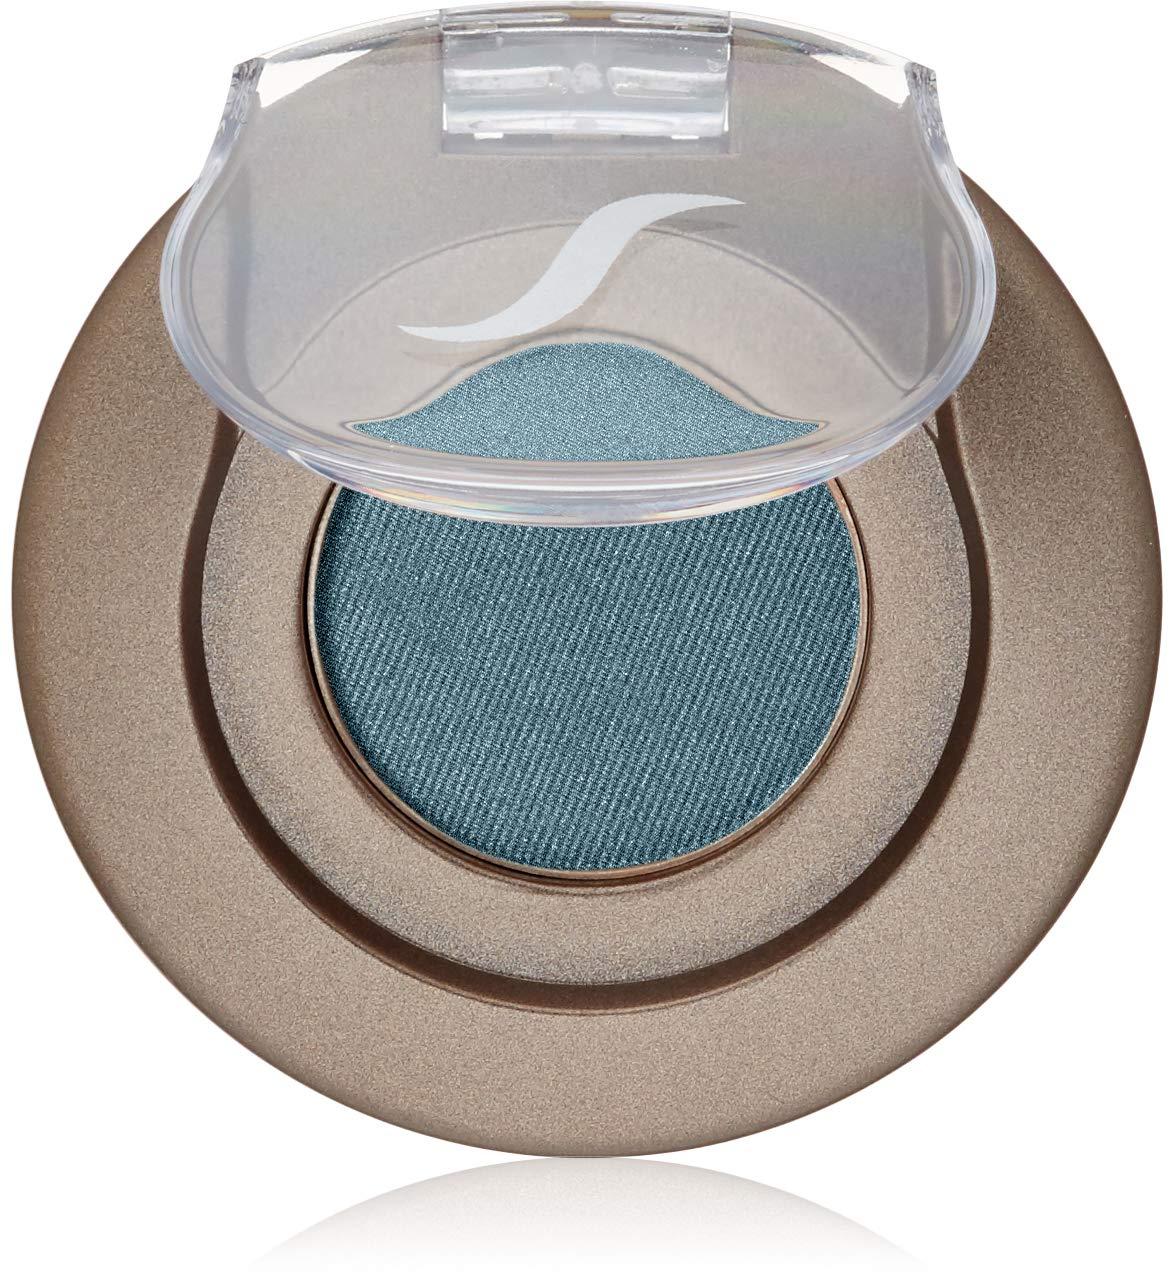 Sorme Cosmetics Mineral Botanicals Eye Shadow, Attitude, 0.05 Ounce